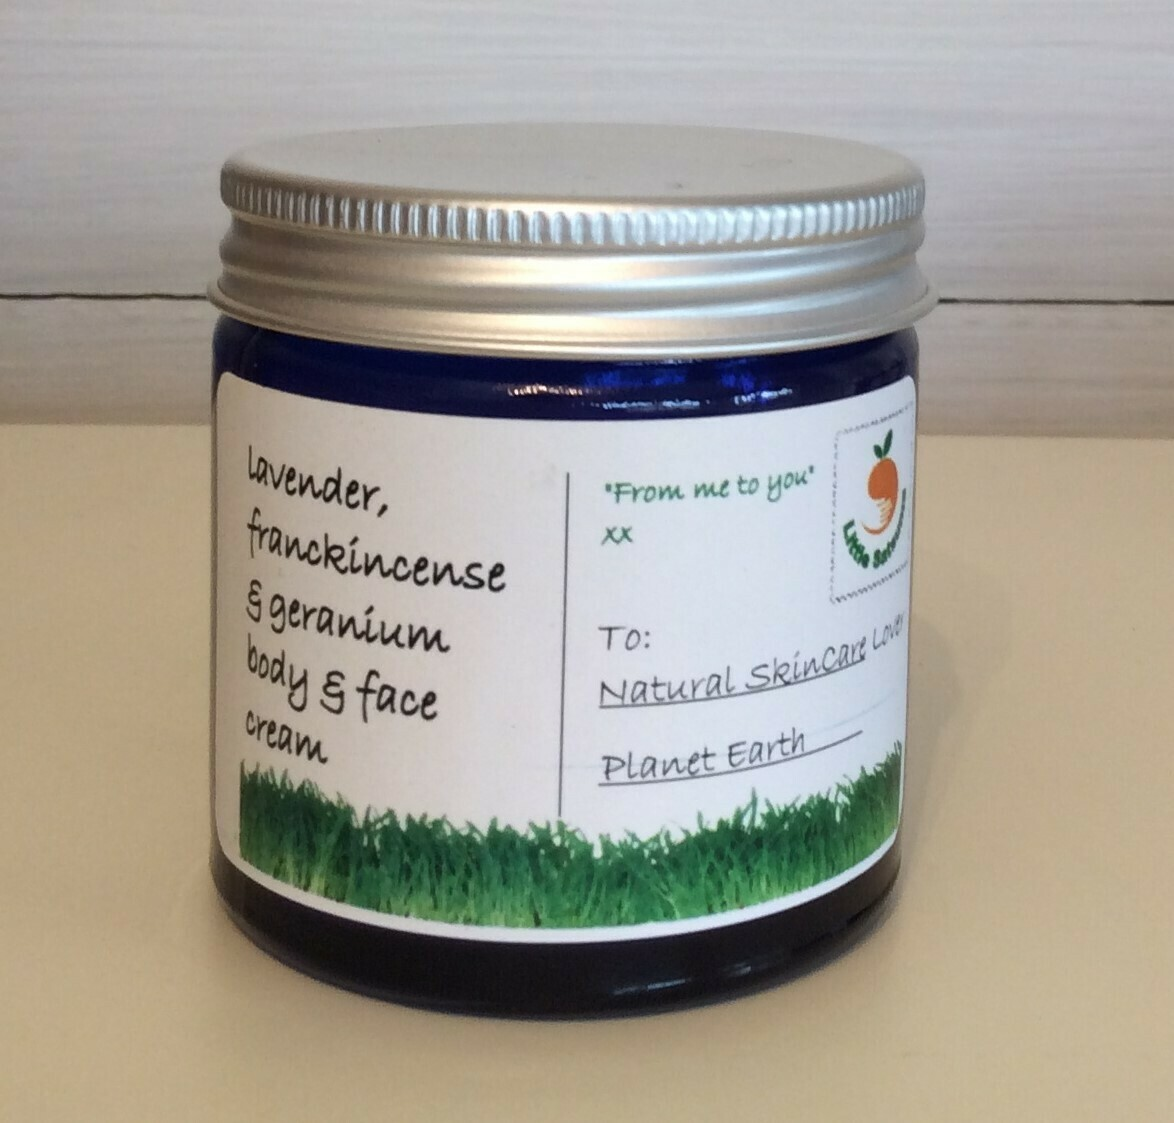 Lavender, Geranium & Frankincense Moisturiser by Little Satsuma (60ml)